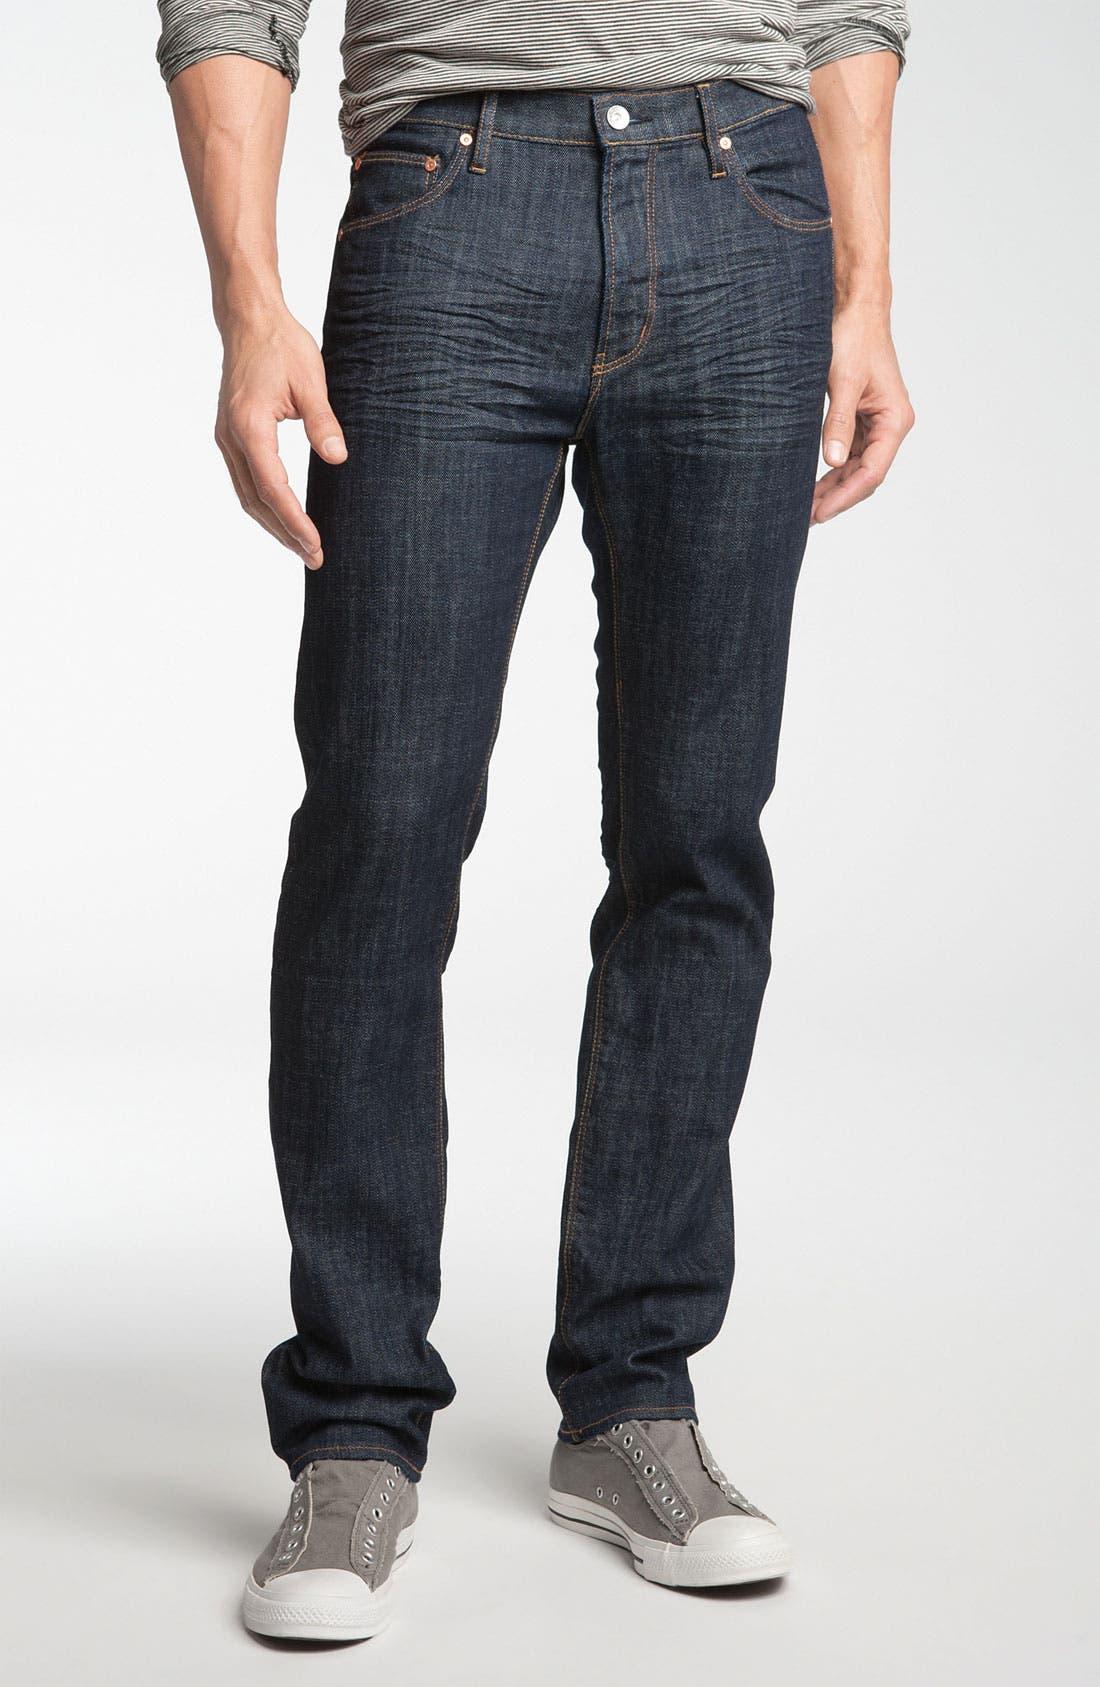 Alternate Image 2  - WeSC 'Eddy' Slim Fit Jeans (Bright)